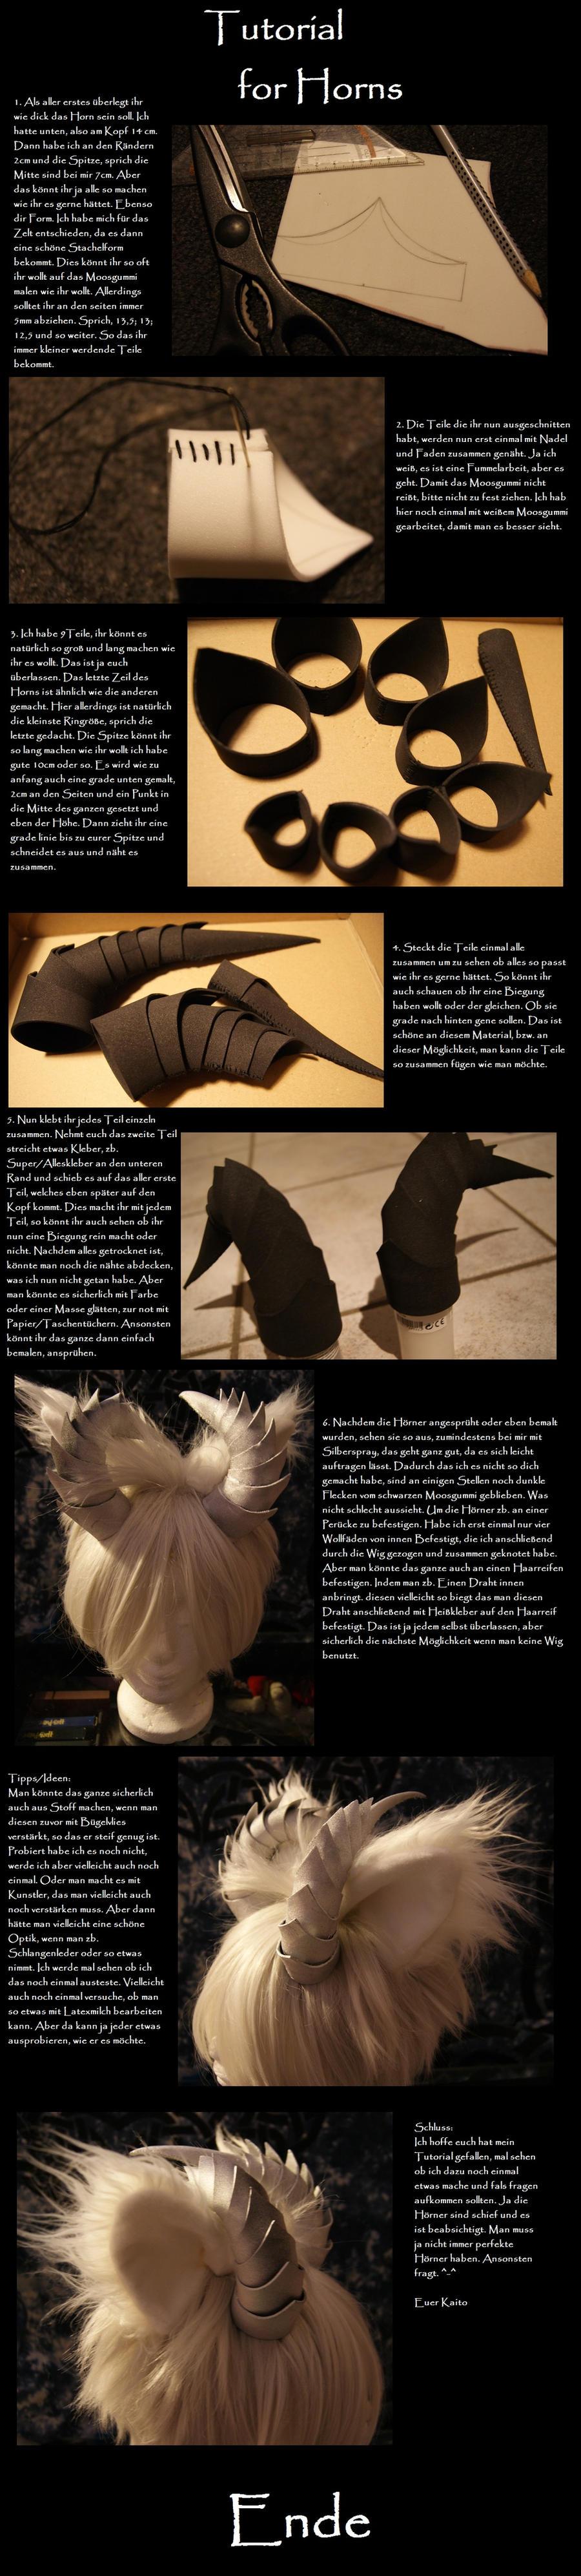 Tutorial for Horns by DevilKaito on DeviantArt